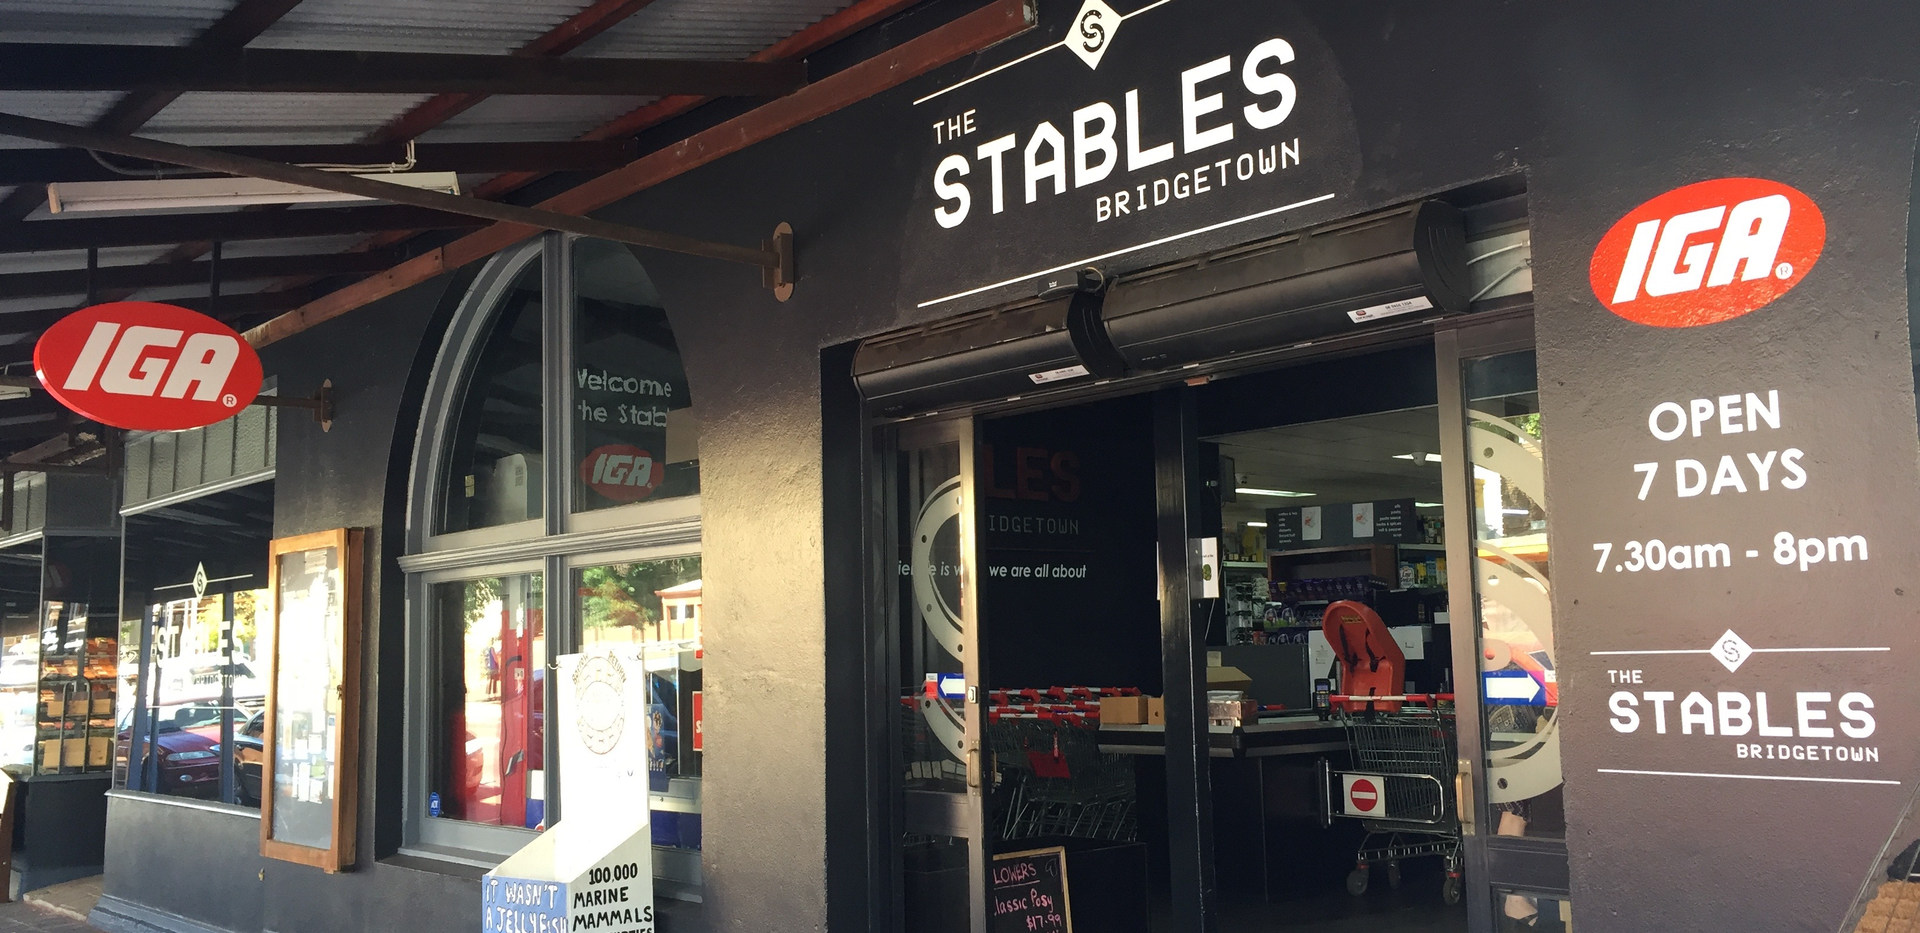 iga-stables-bridgetown-53.jpg